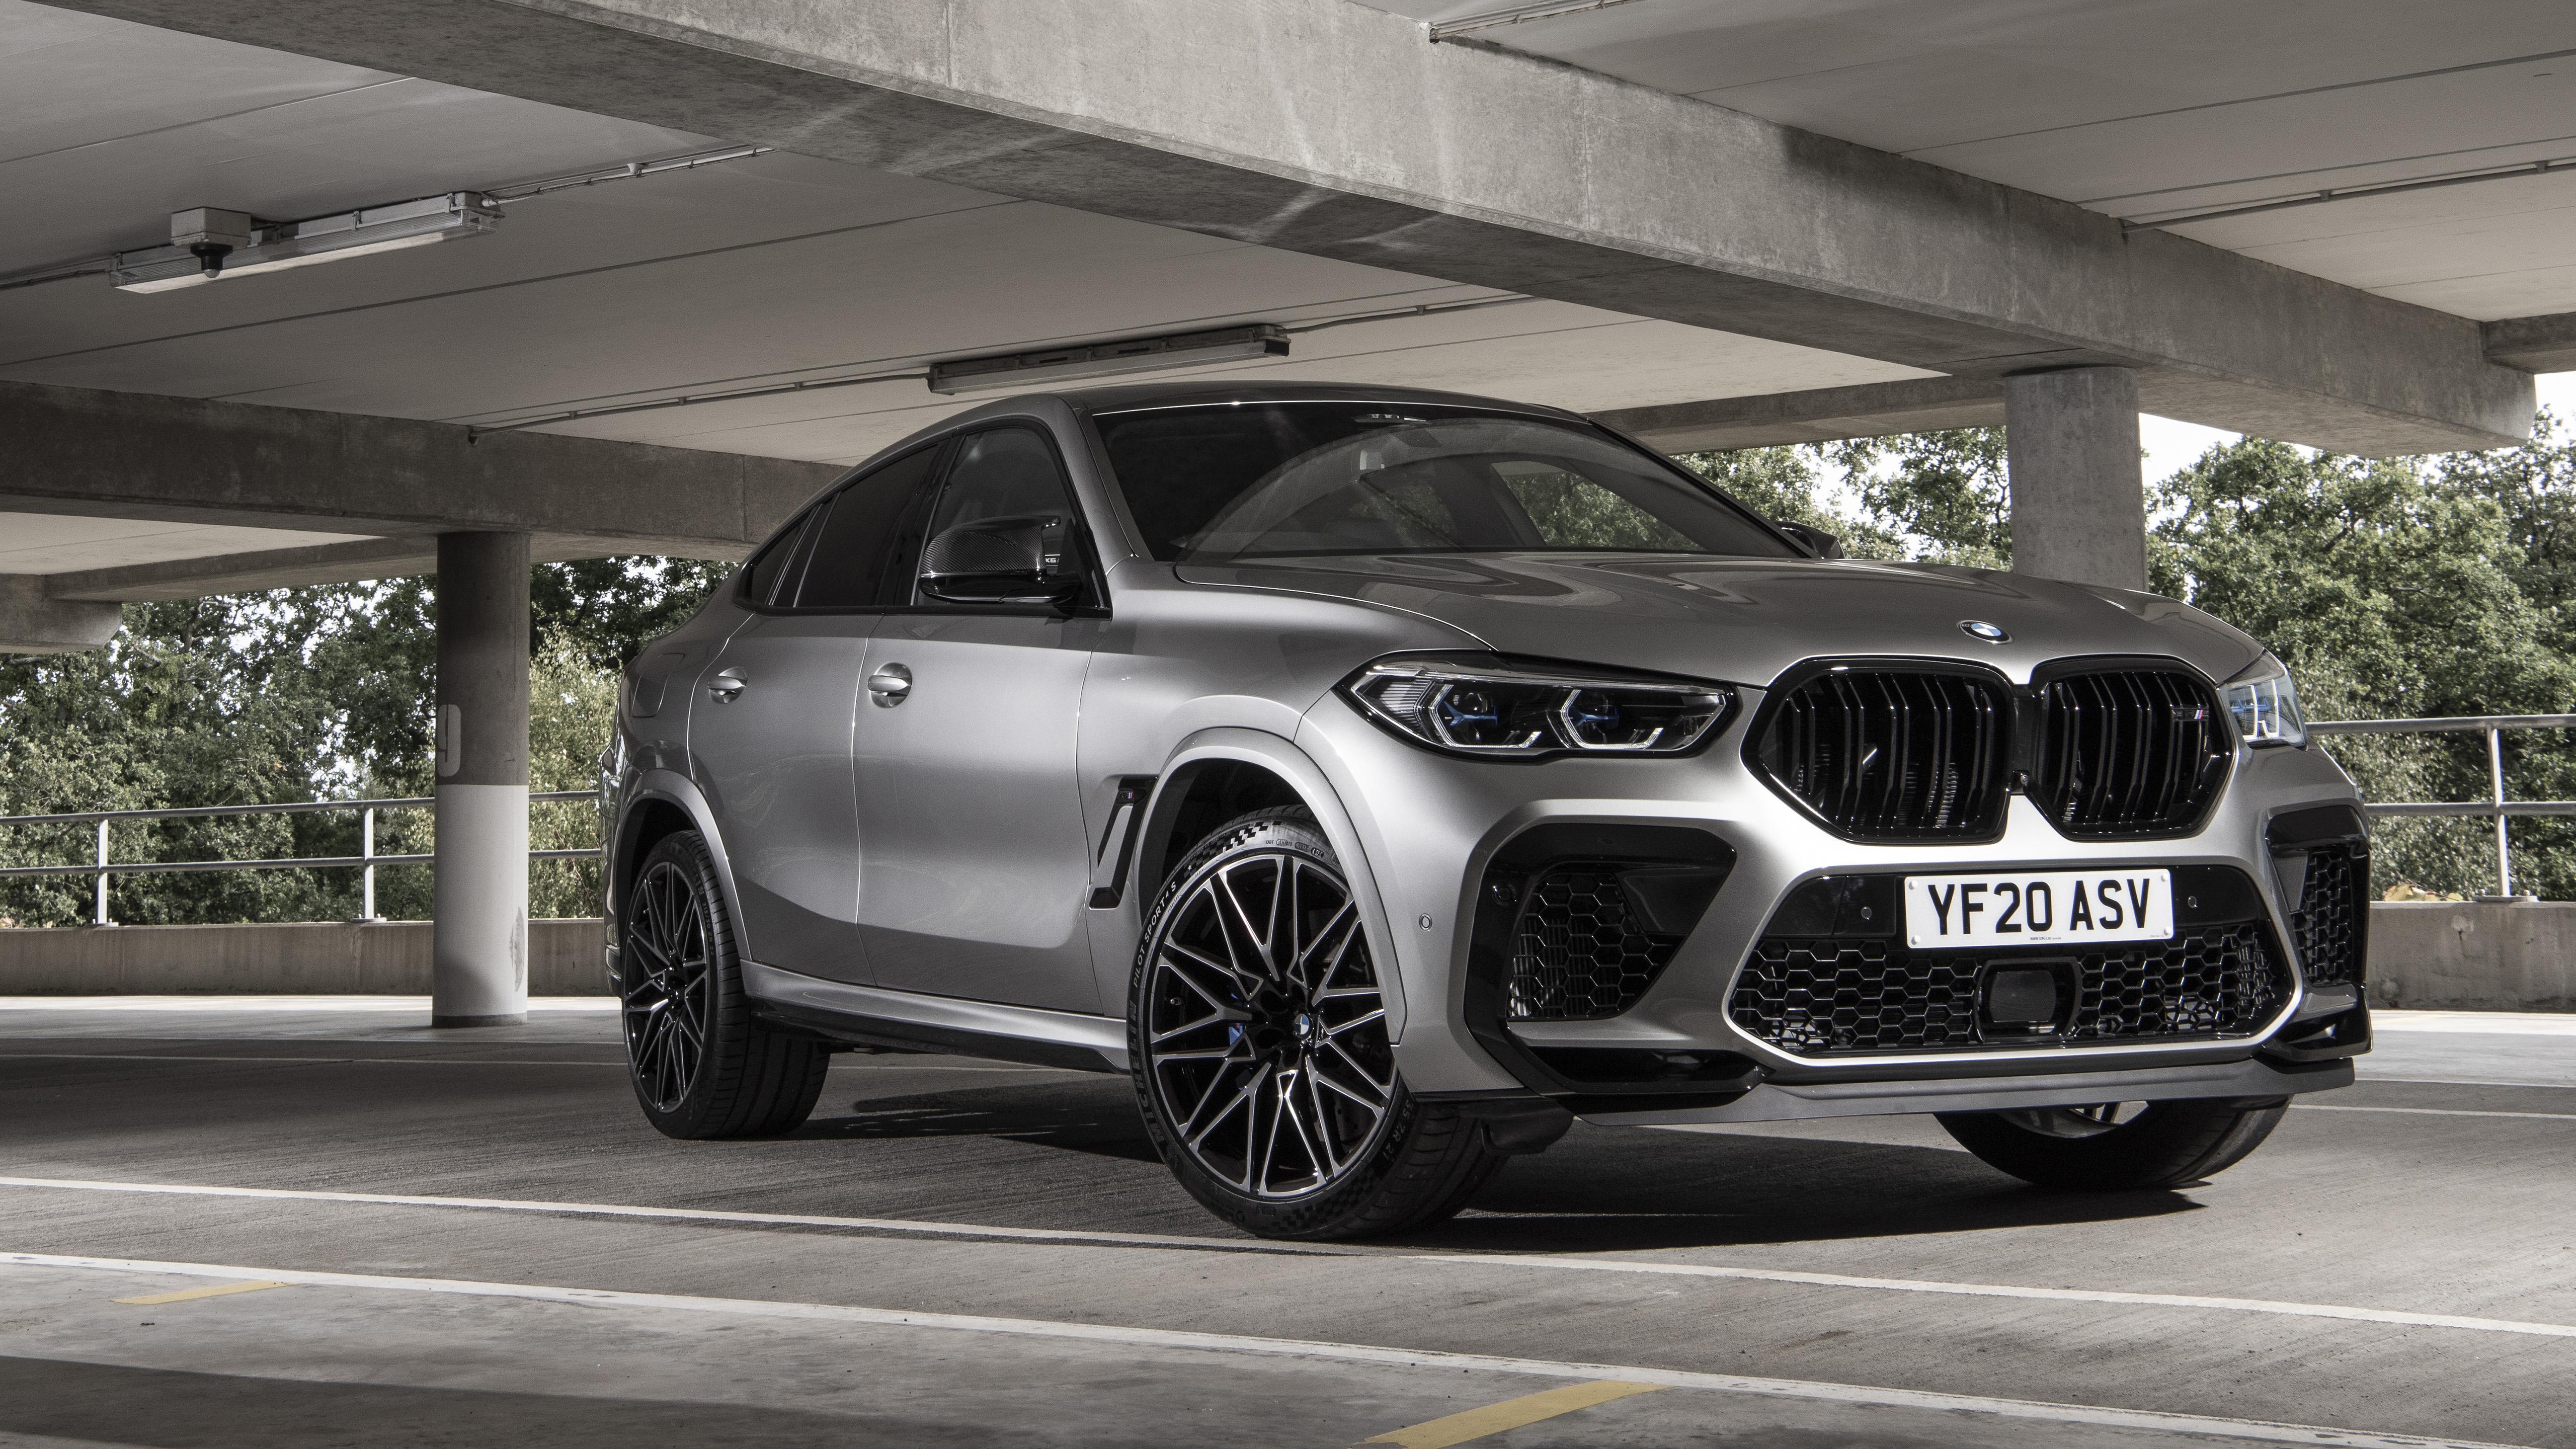 BMW X6 M Competition 2020 5K 2 Wallpaper | HD Car ...